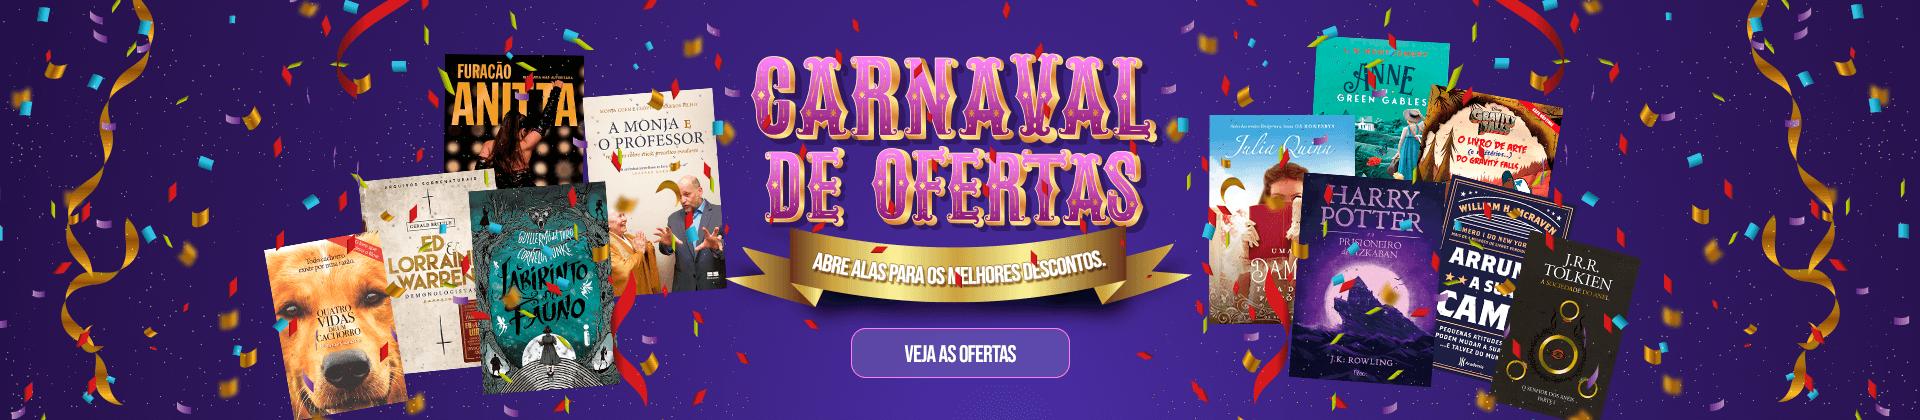 Carnaval de Ofertas - Geral